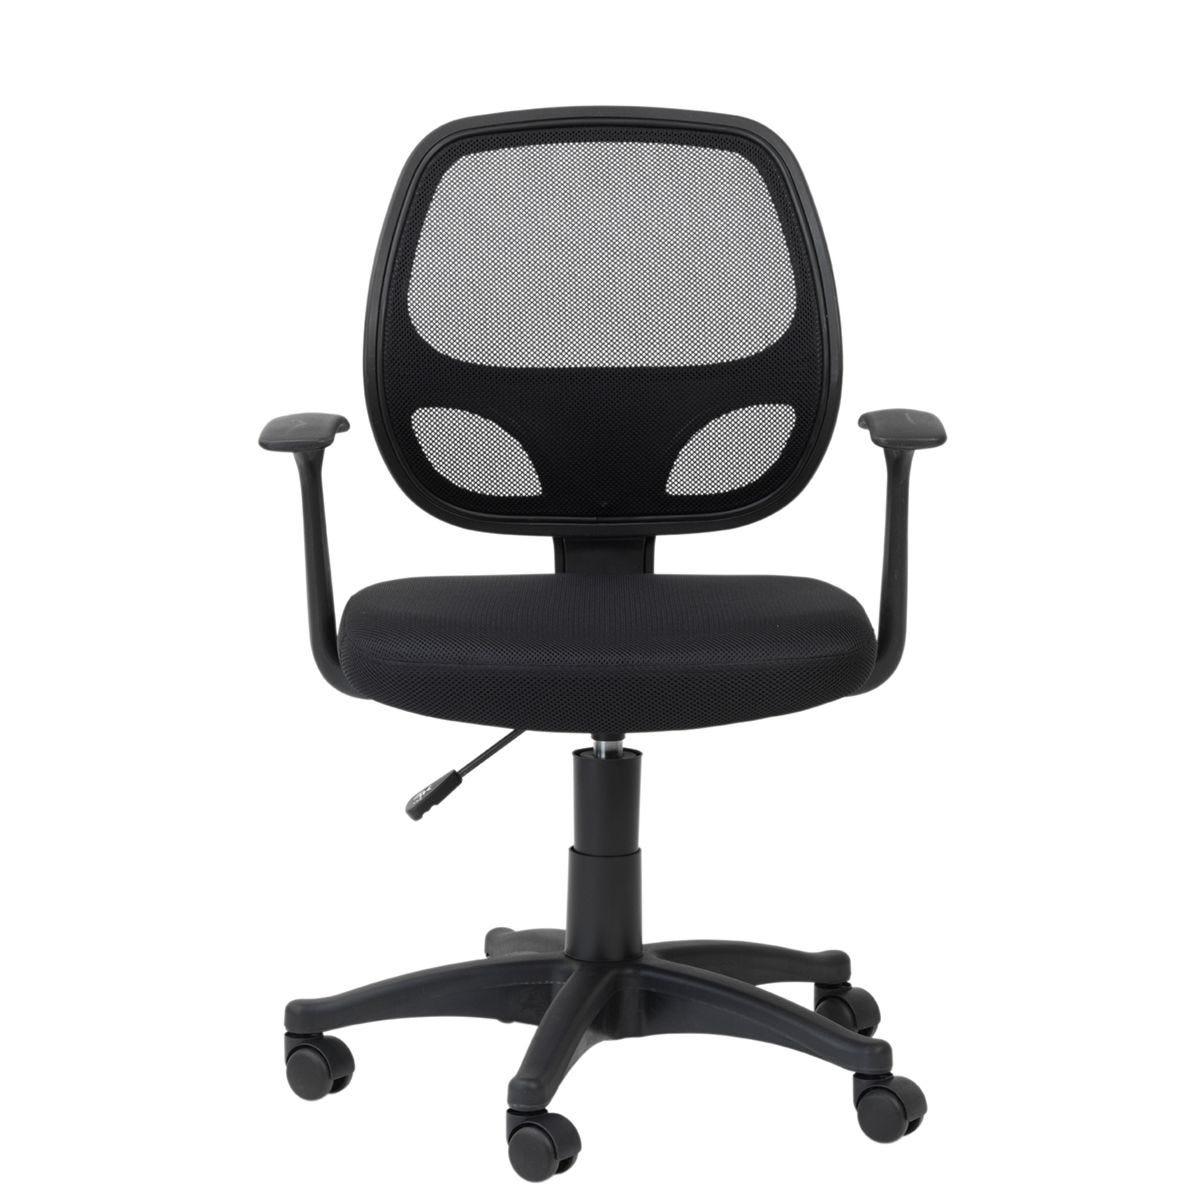 Alphason Davis Operator Chair - Black